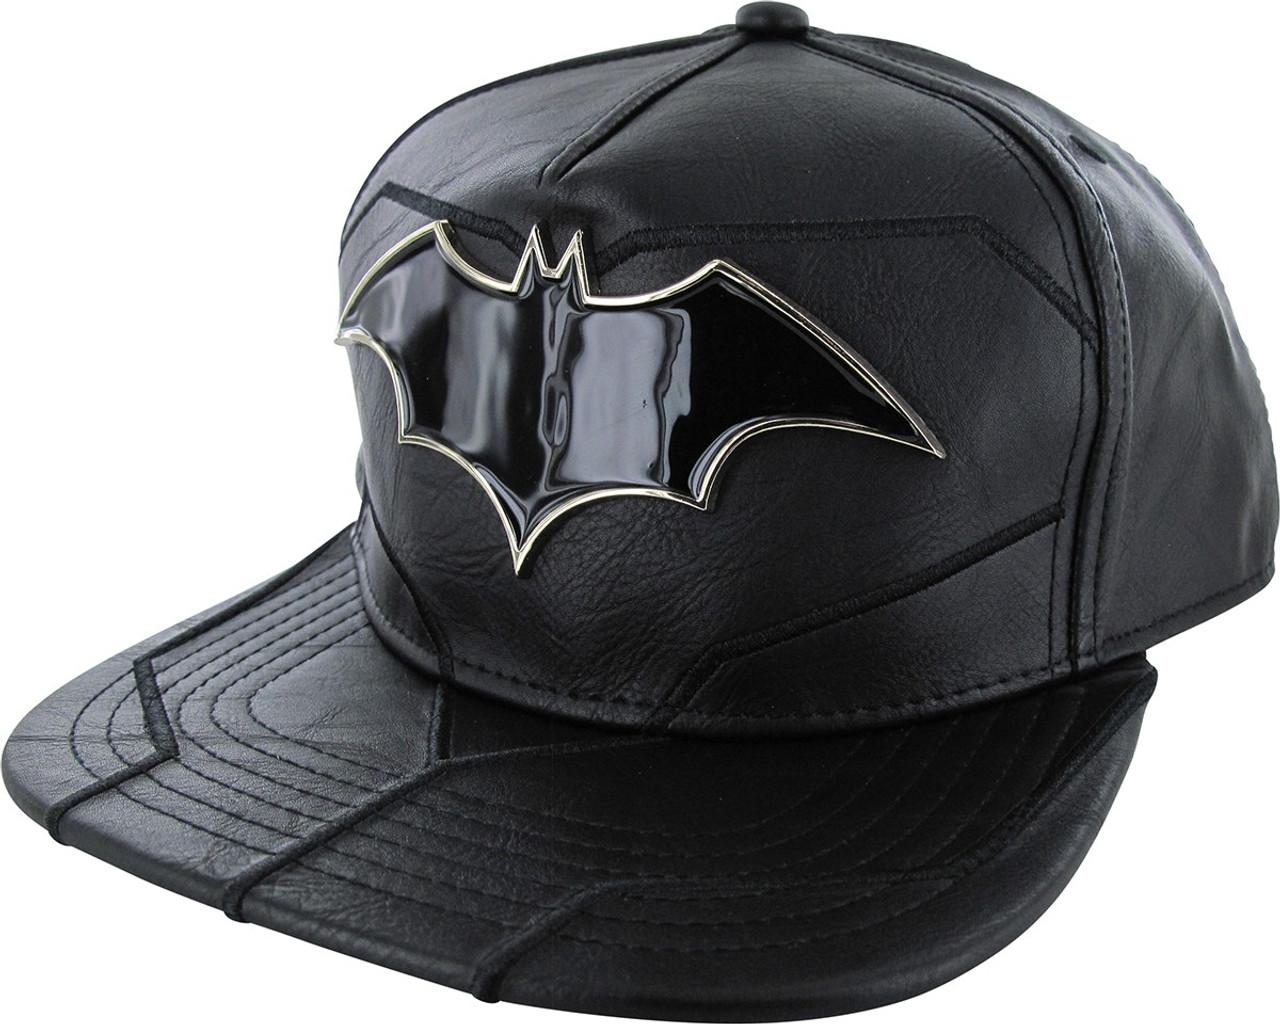 finest selection 68e24 974e9 hat-batman-rebirth-logo-suit-up-snp  91490.1542398641.jpg c 2 imbypass on